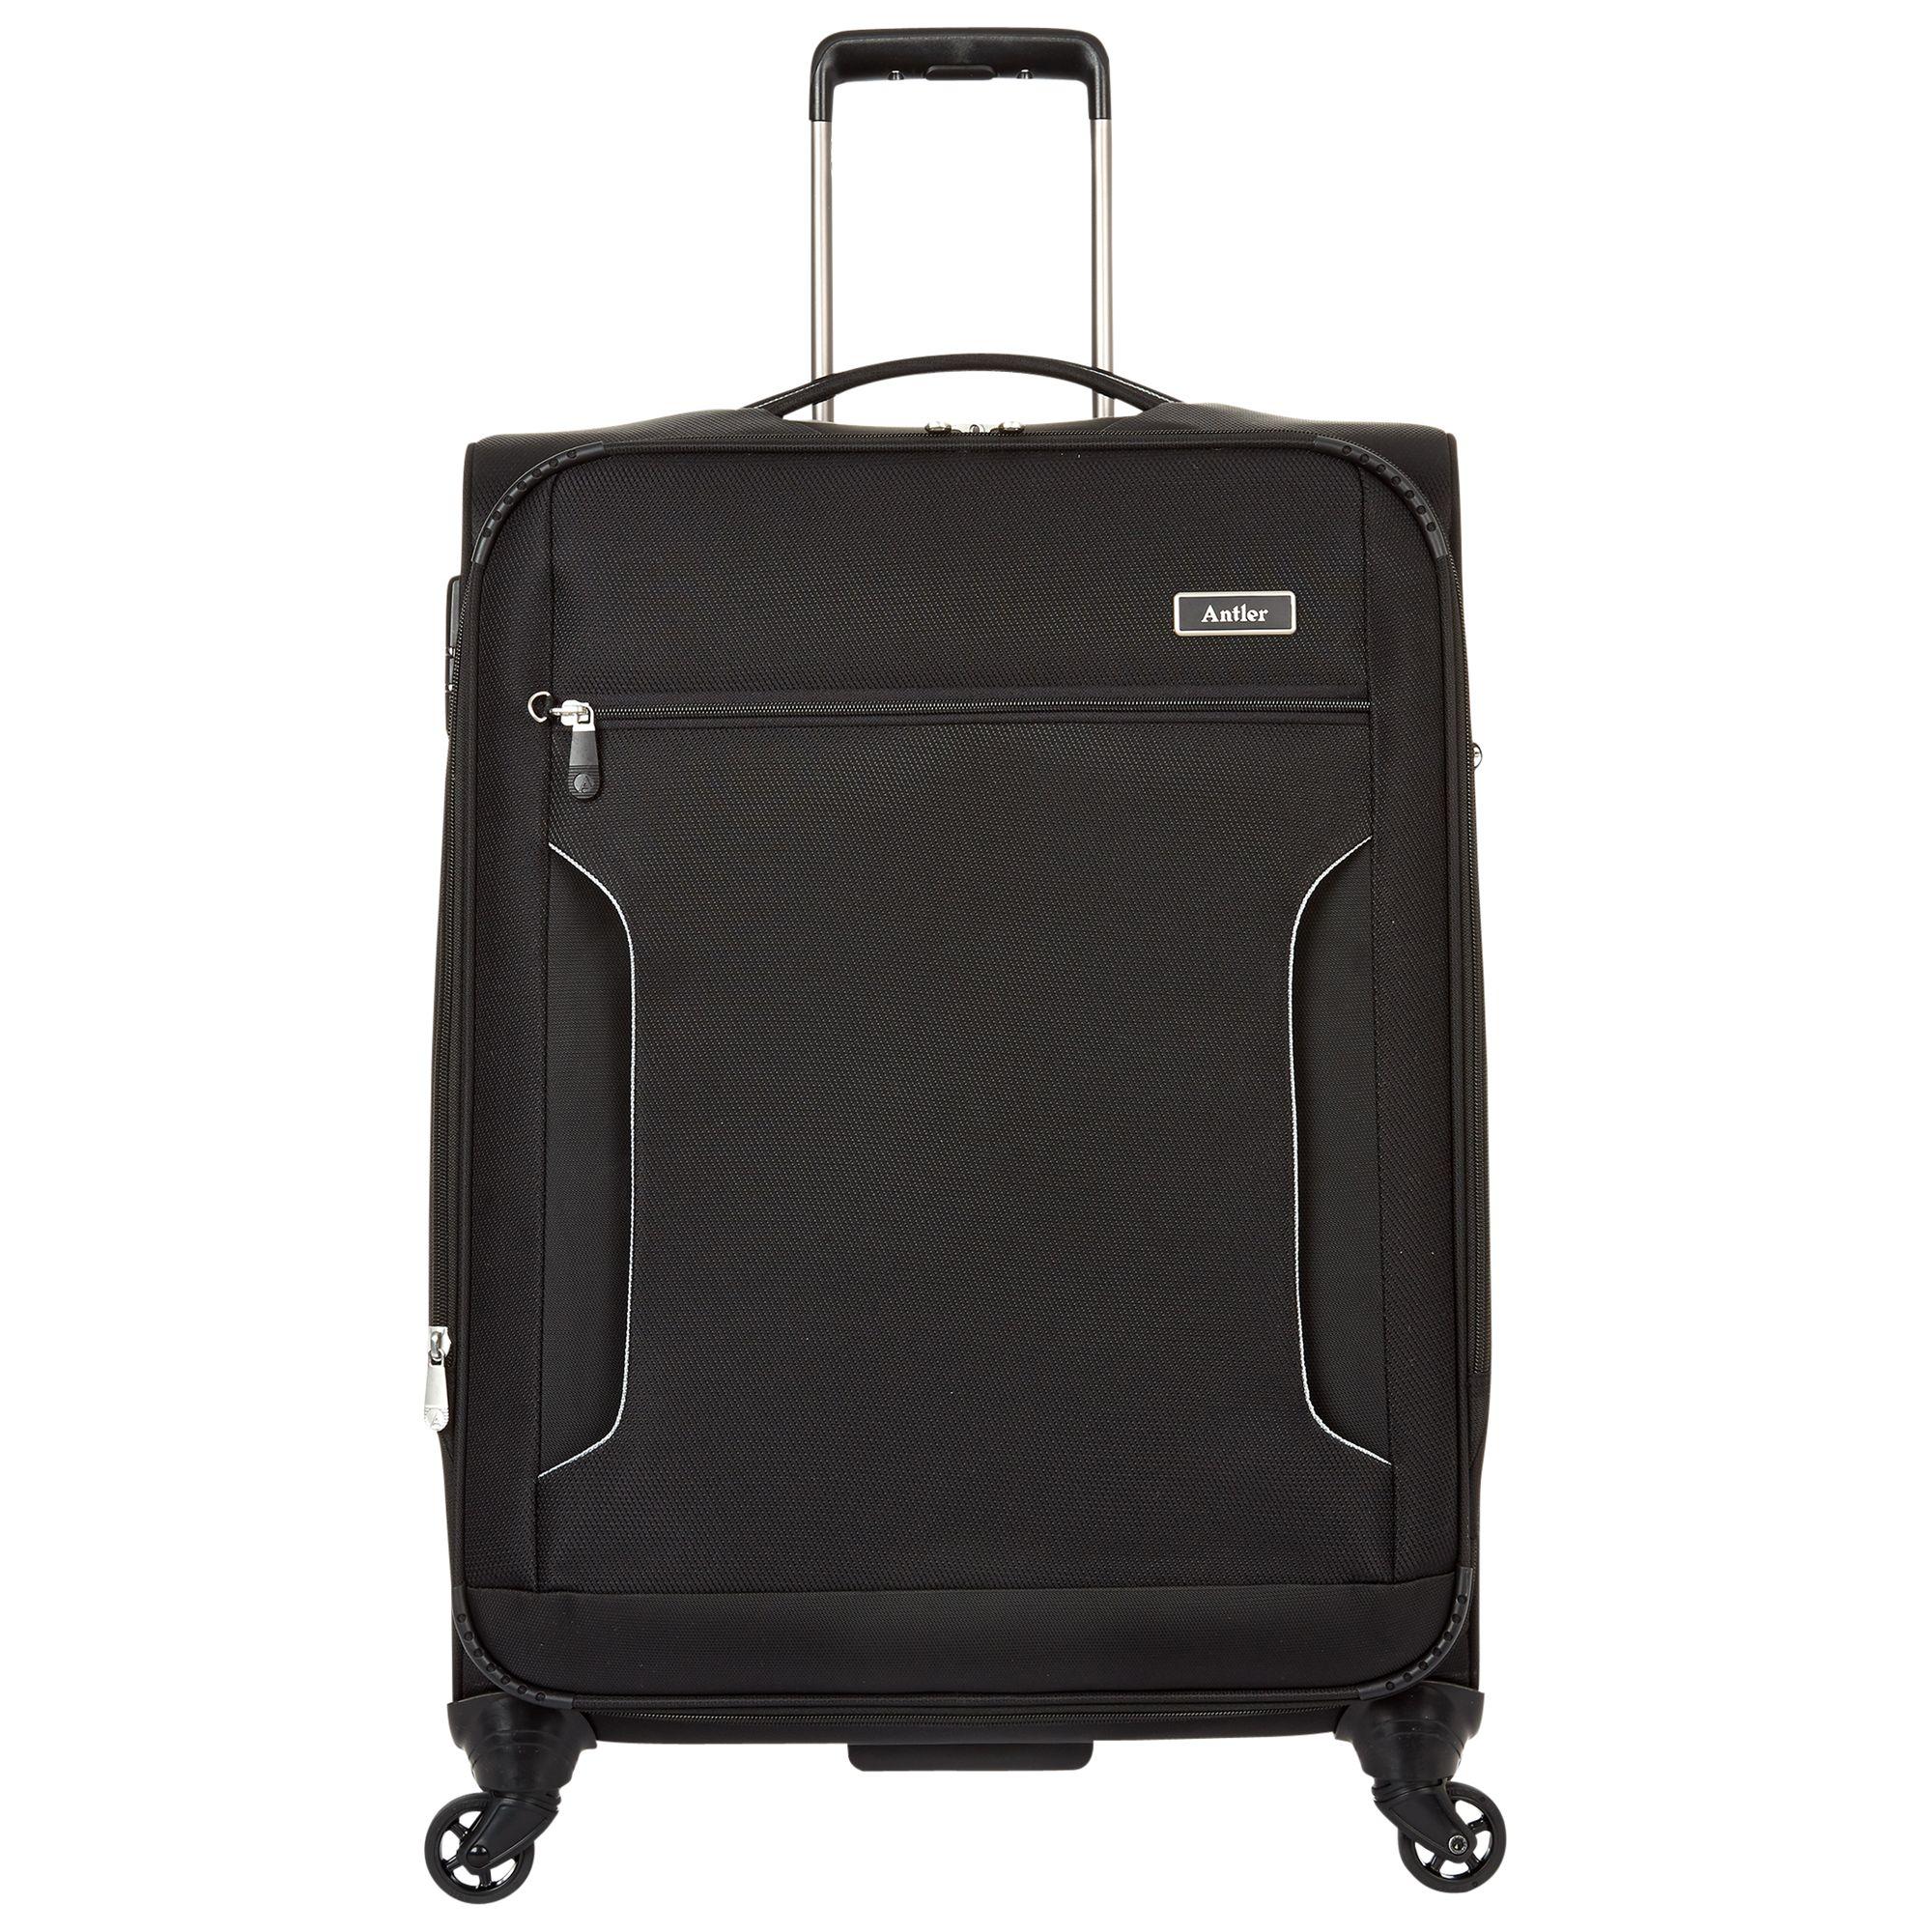 Antler Antler Cyberlite II 4-Wheel 68cm Medium Suitcase